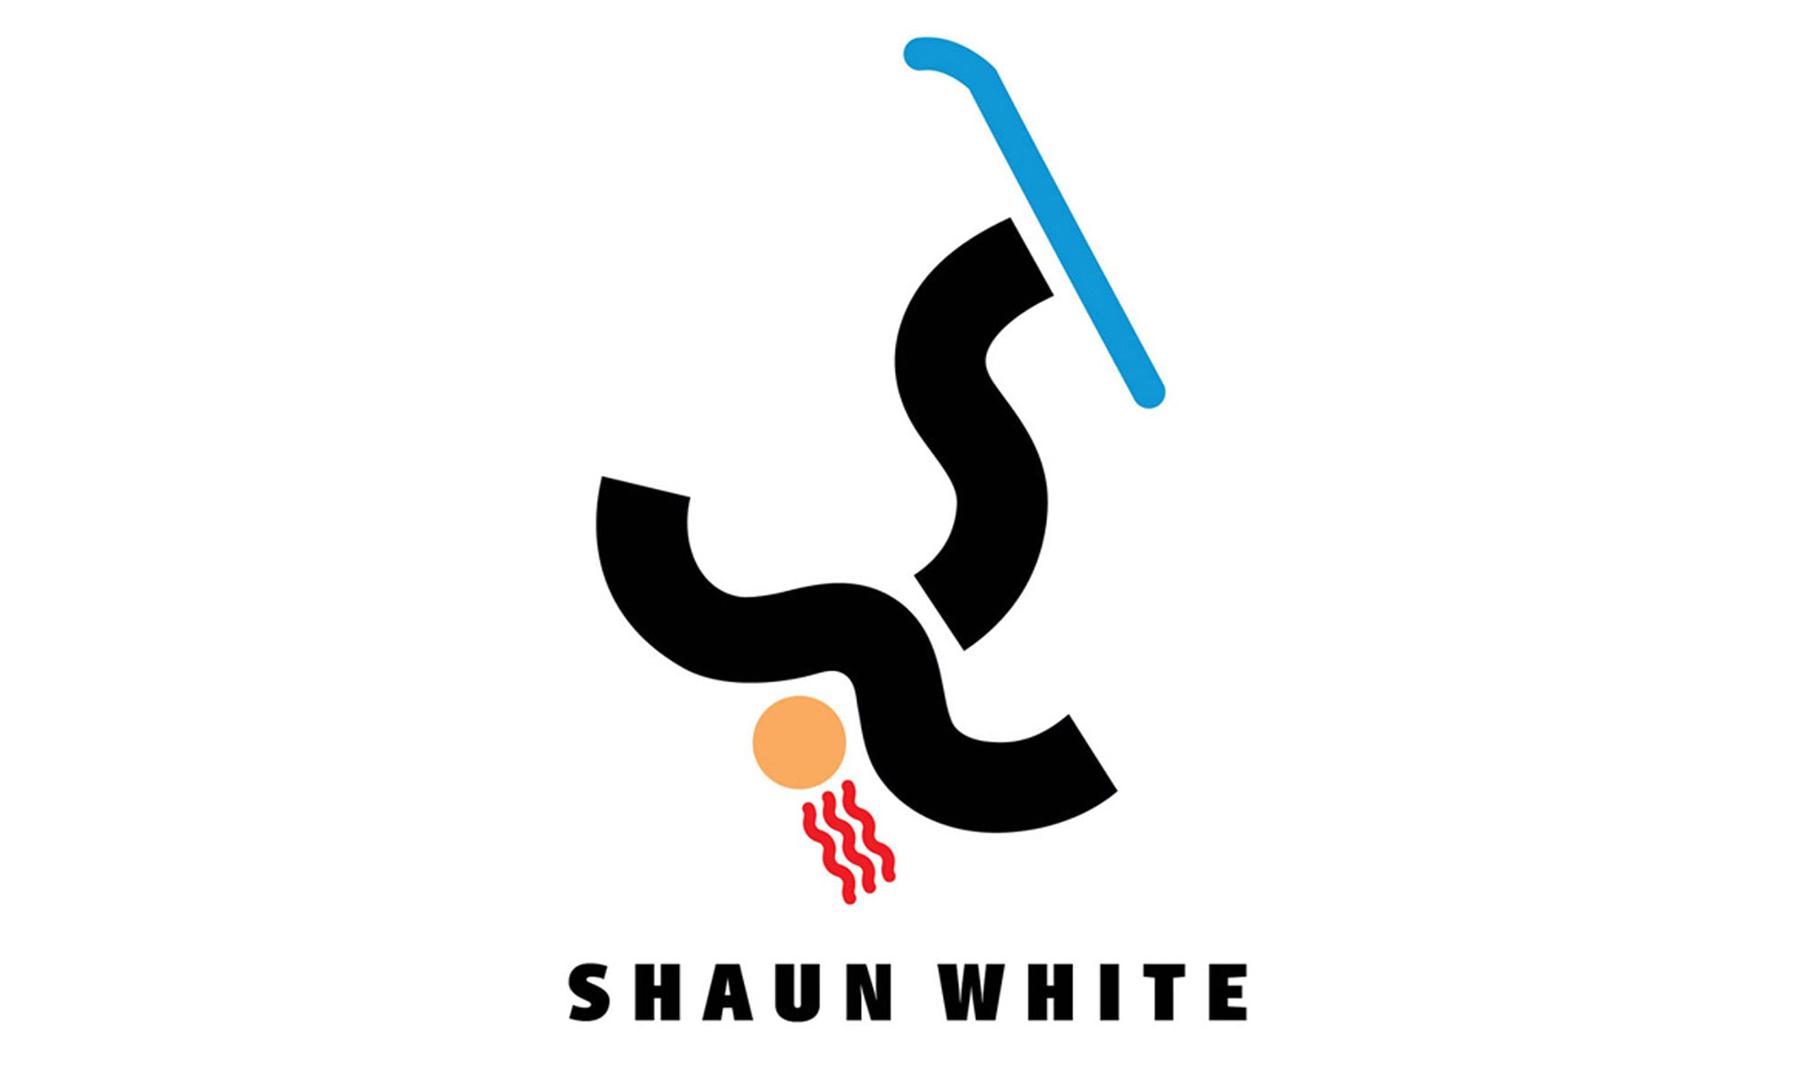 Kelly-Hume-048-Shaun-White.jpg